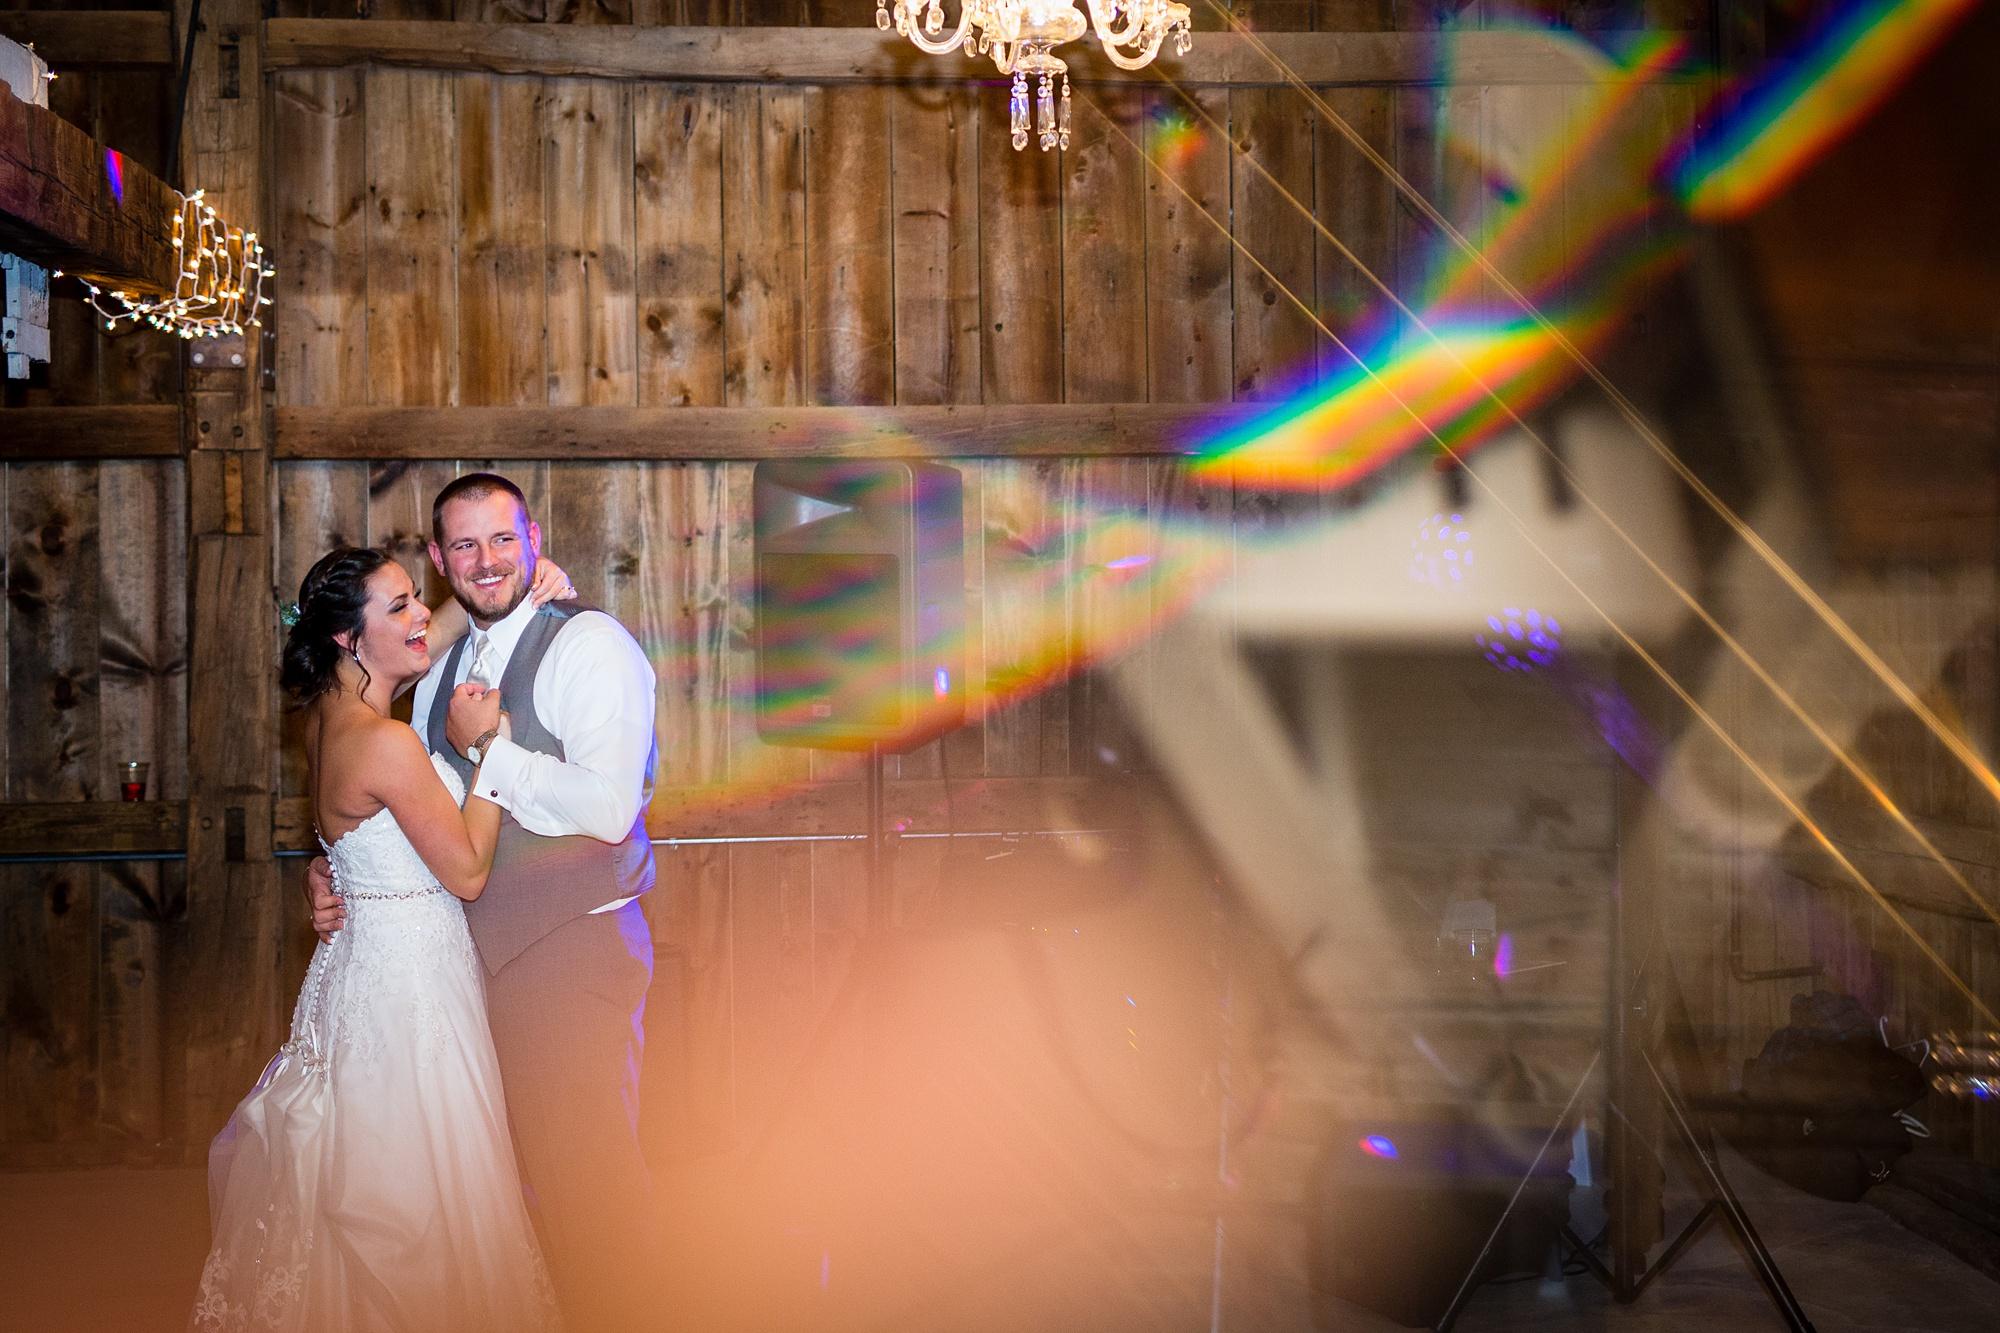 Brandon_Shafer_Photography_Emily_Travis_Kalamazoo_Wedding_Photography_0053.jpg